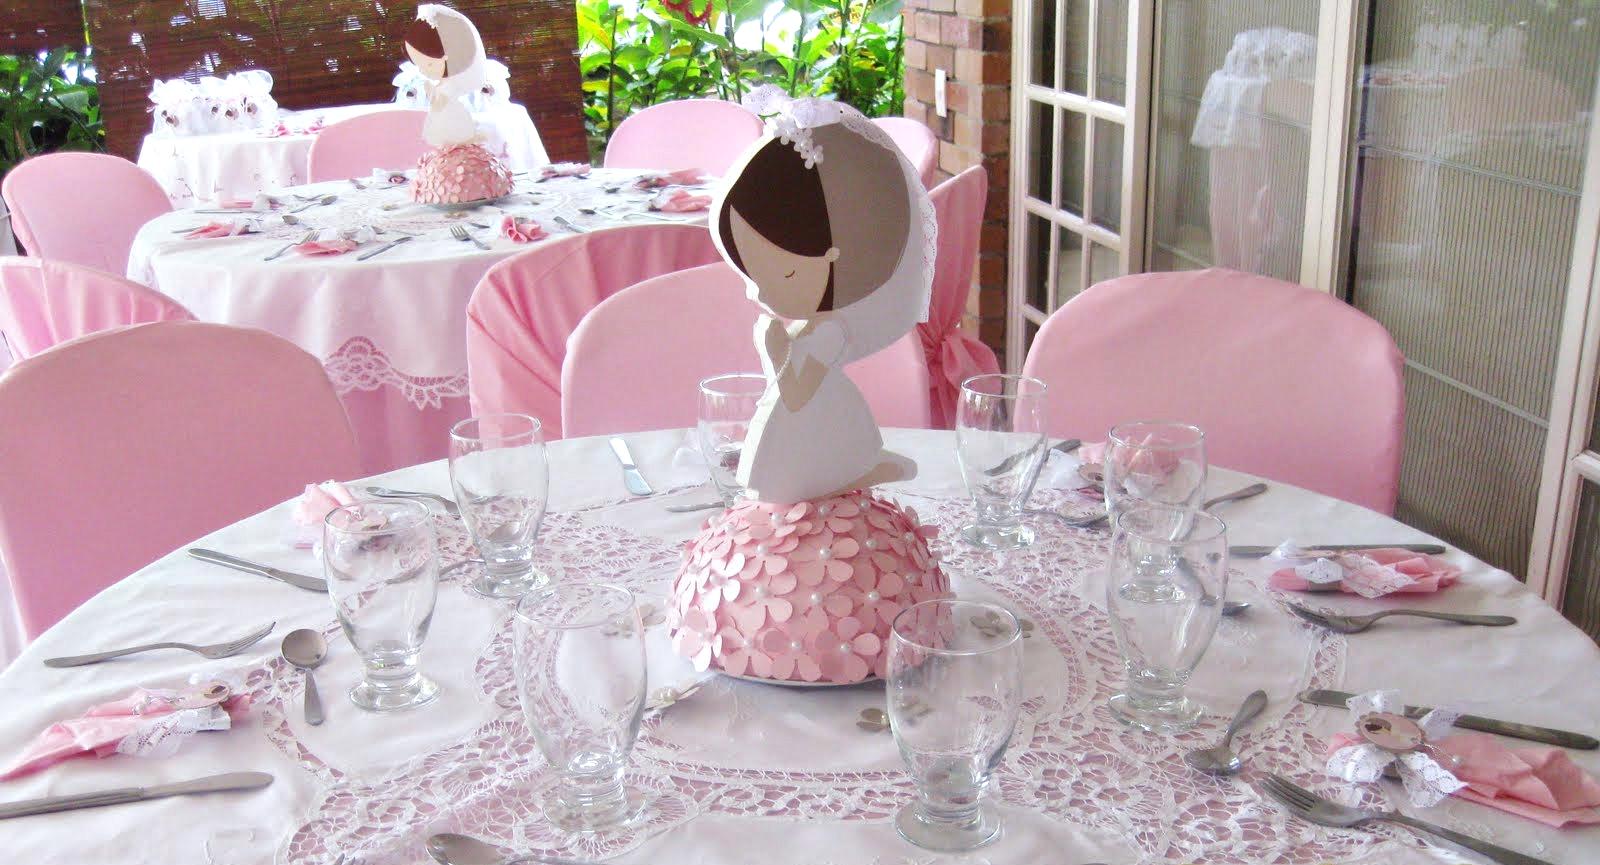 decoracion primera comunion nina centros de mesa